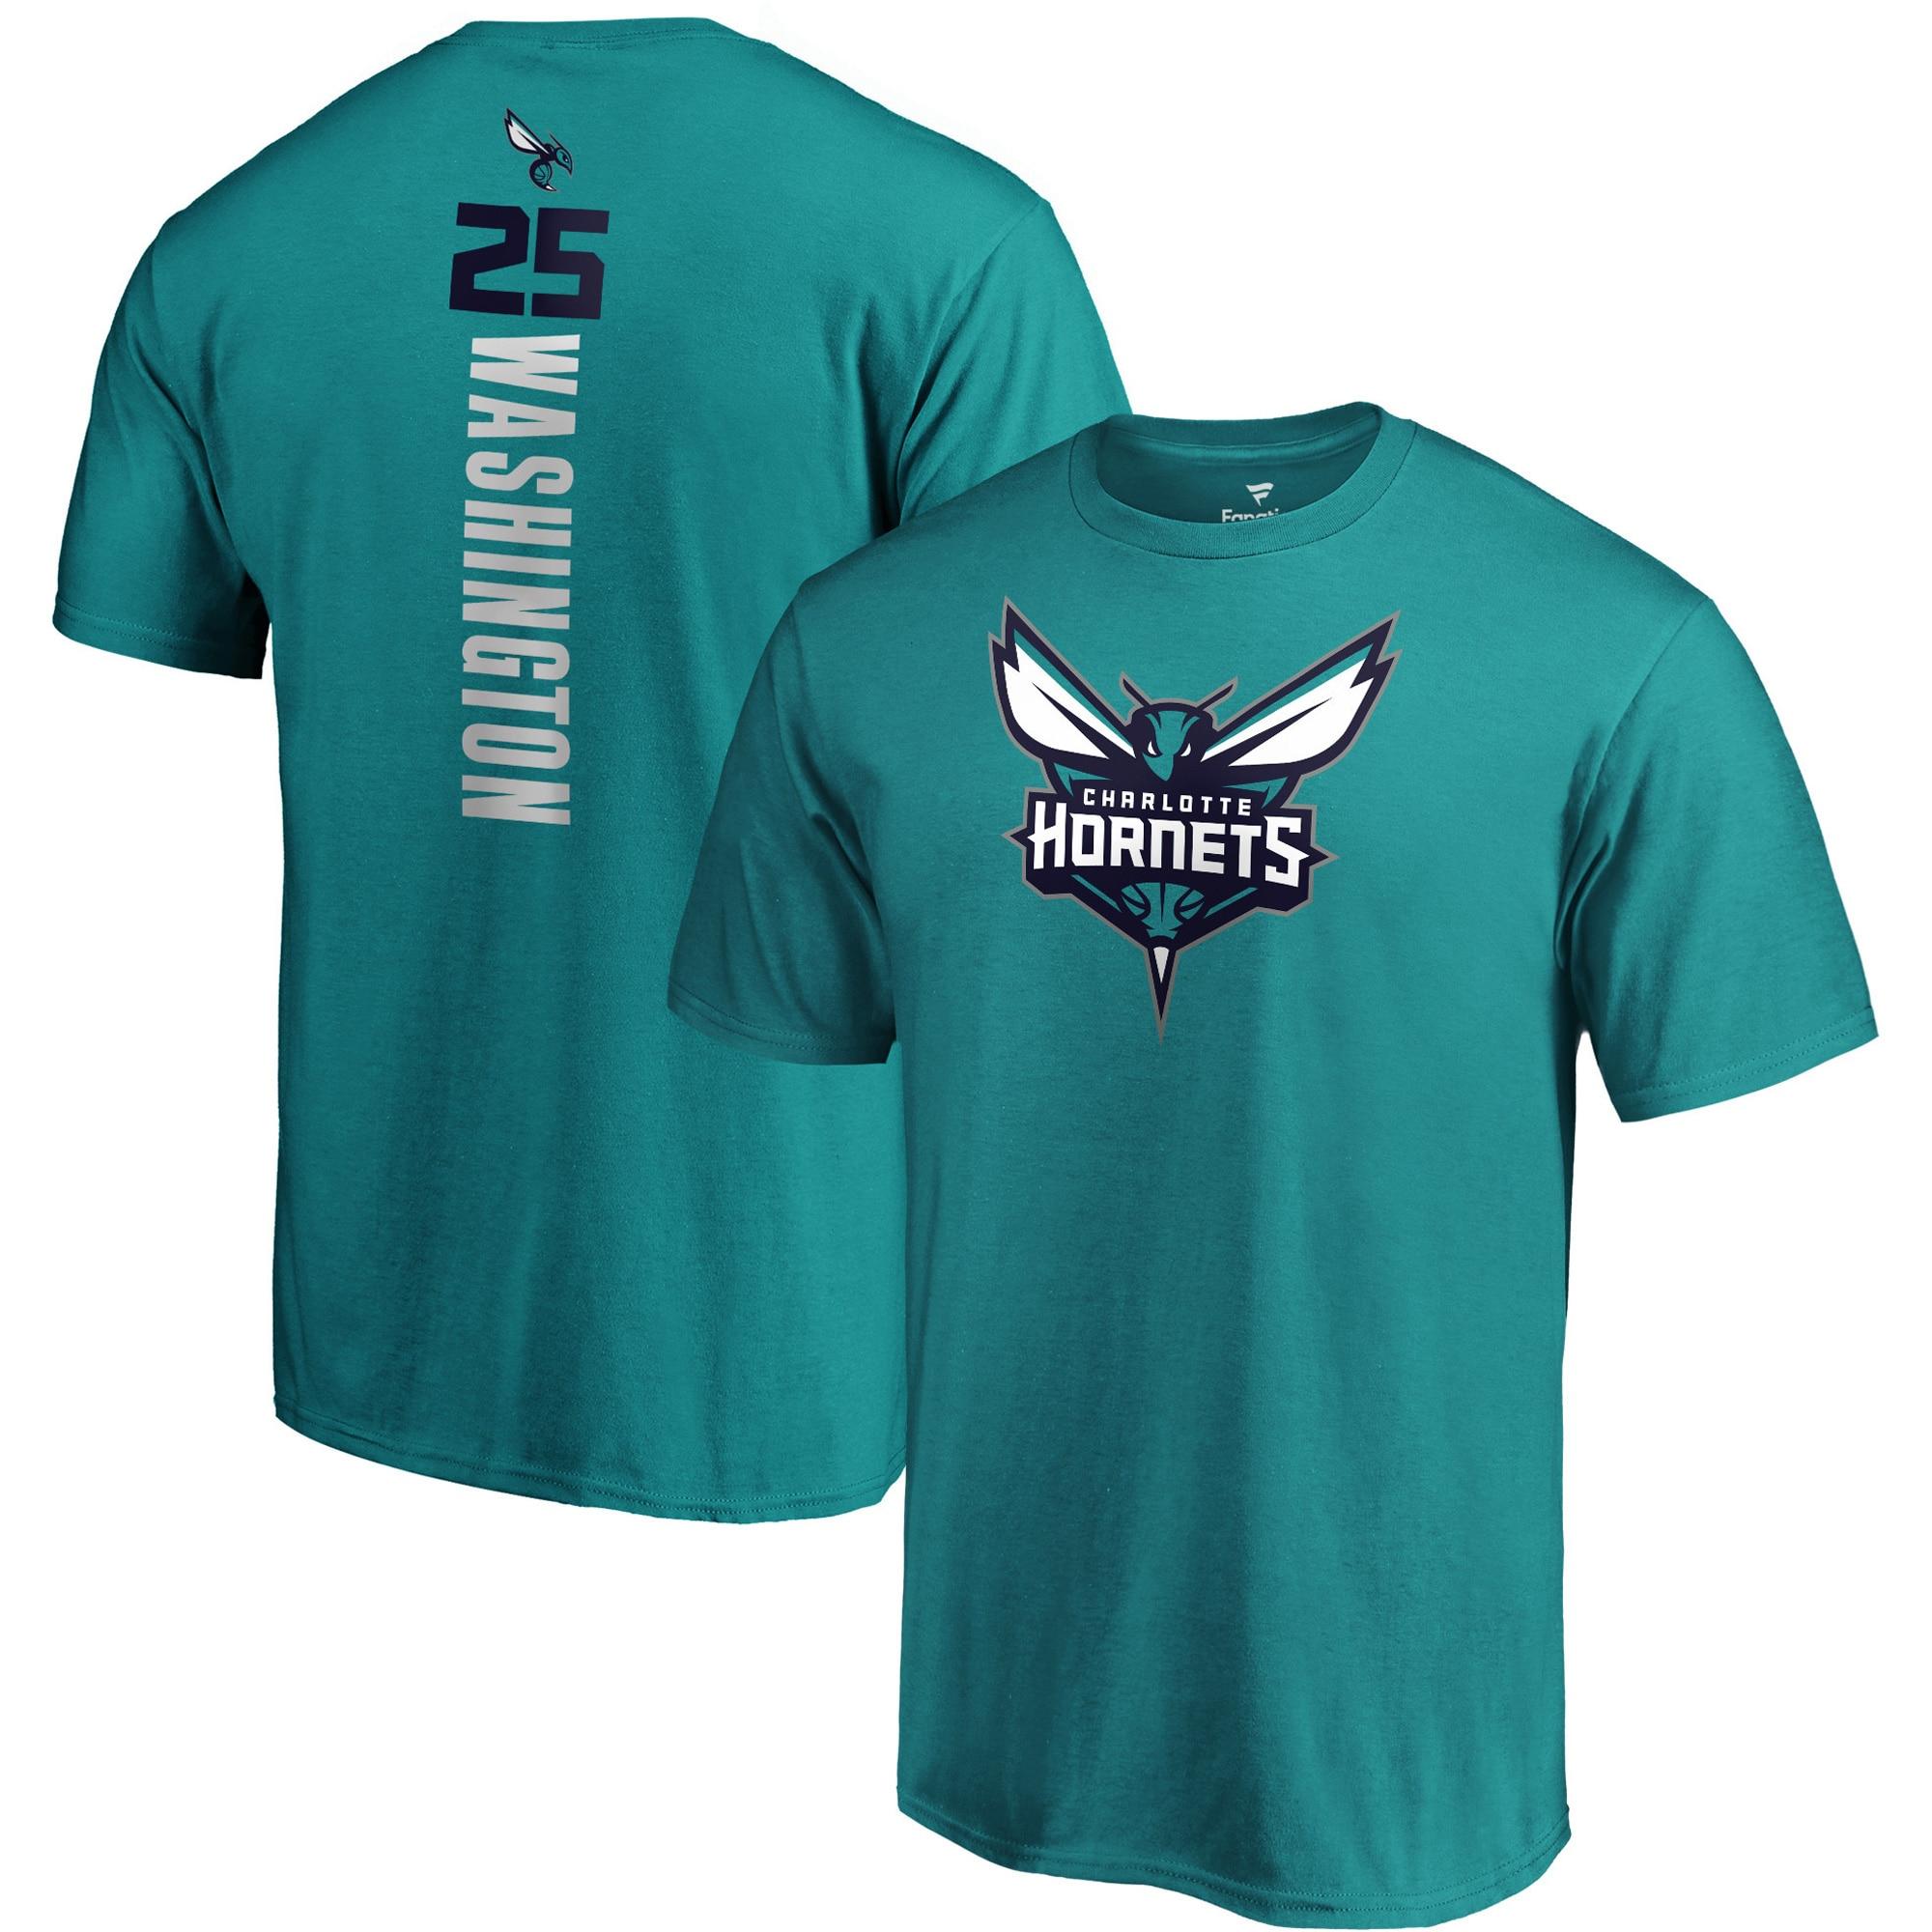 PJ Washington Charlotte Hornets Fanatics Branded Playmaker Name & Number Team Logo T-Shirt - Teal